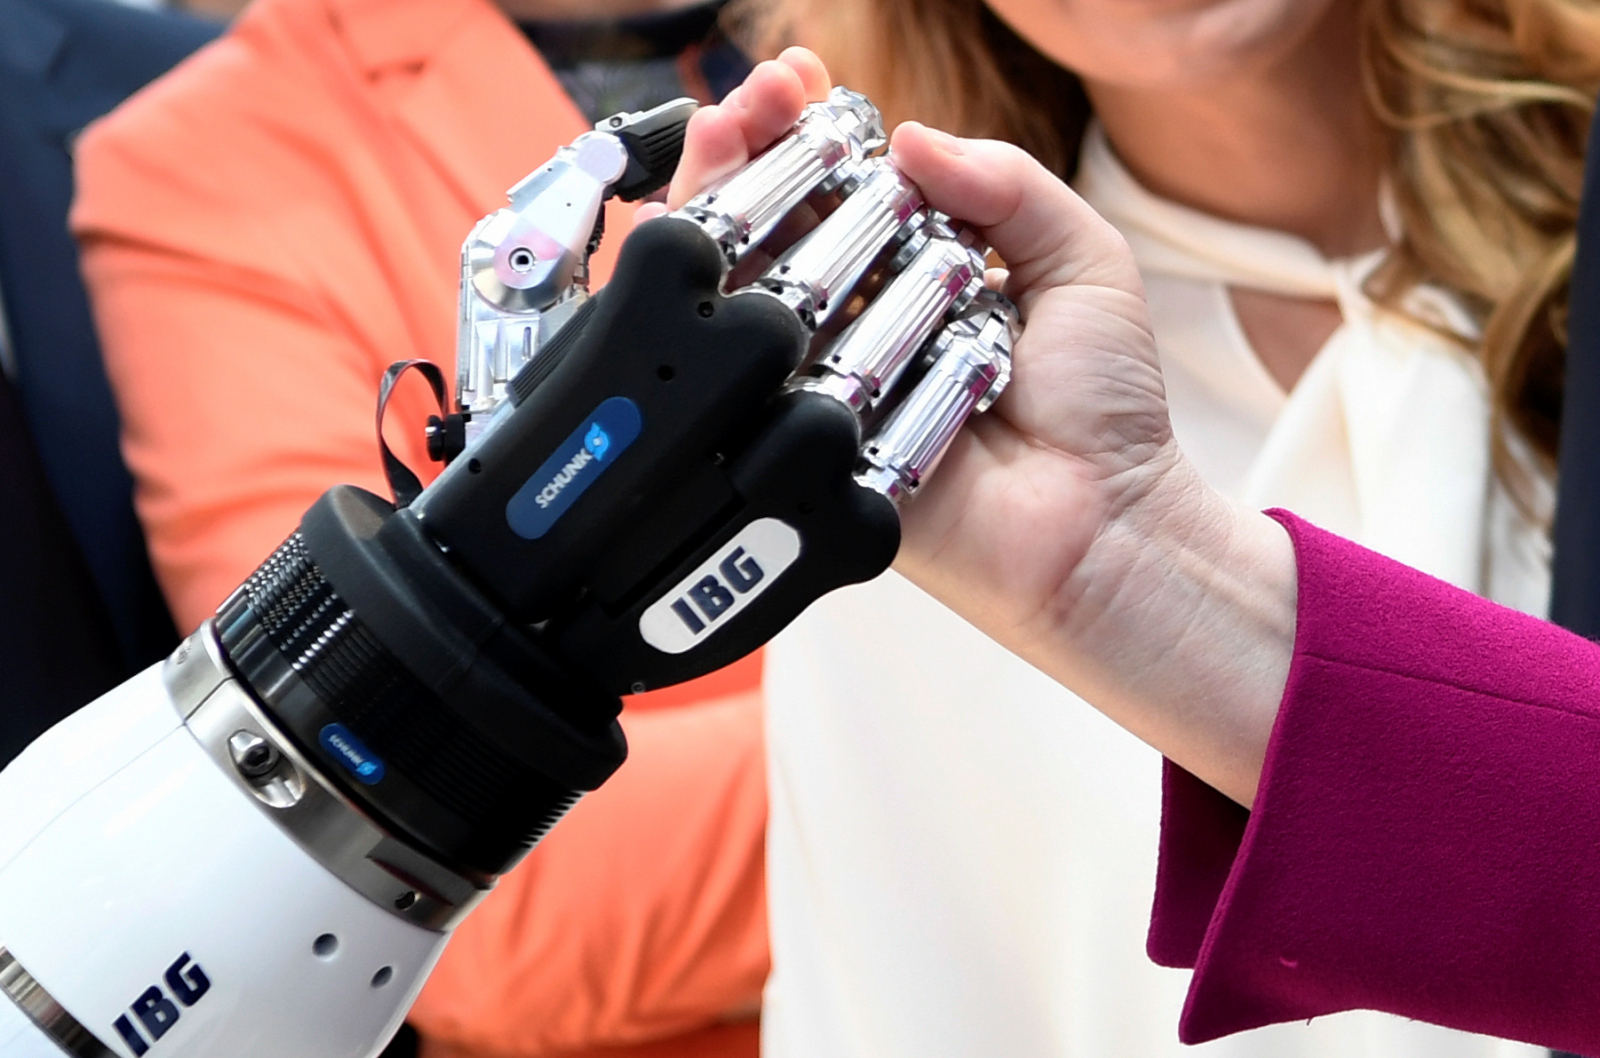 German Chancellor Angela Merkel shakes hands with a humanoid robot